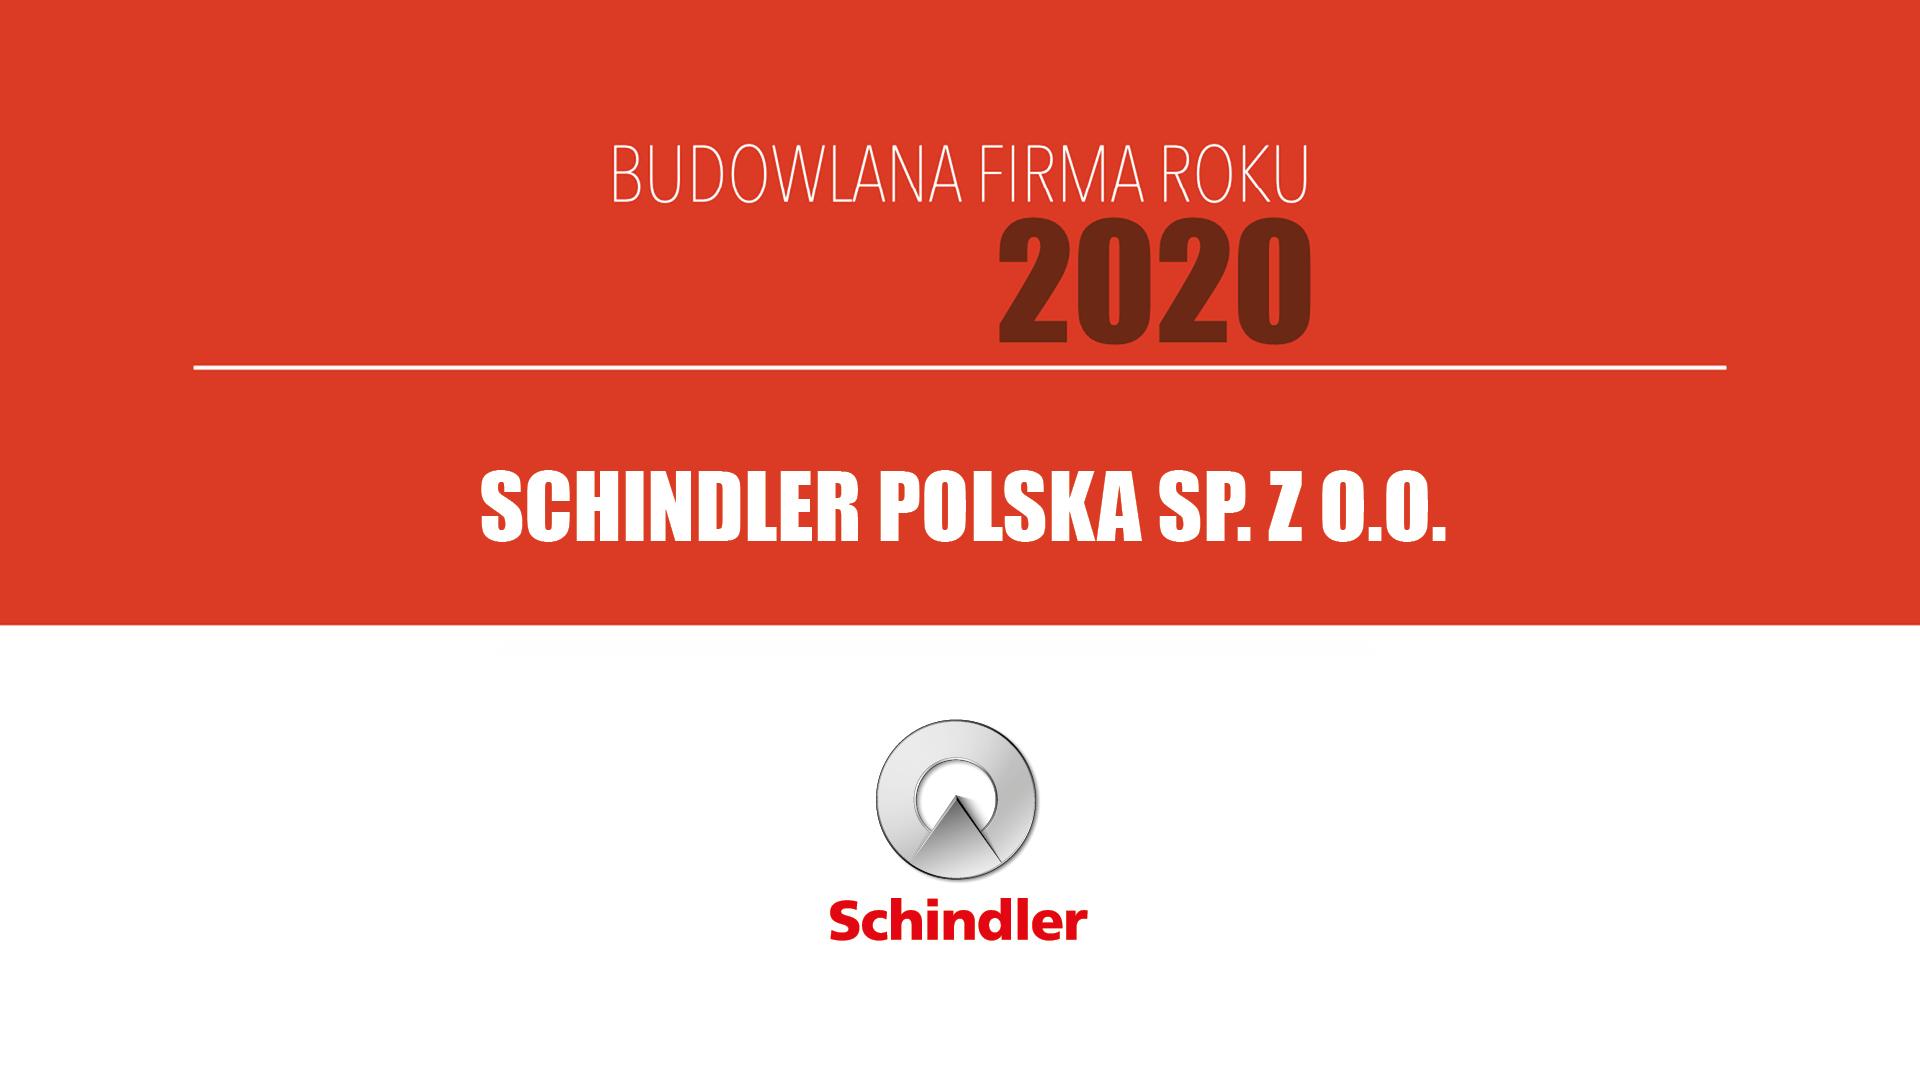 SCHINDLER POLSKA SP. Z O.O. – Budowlana Firma Roku 2020